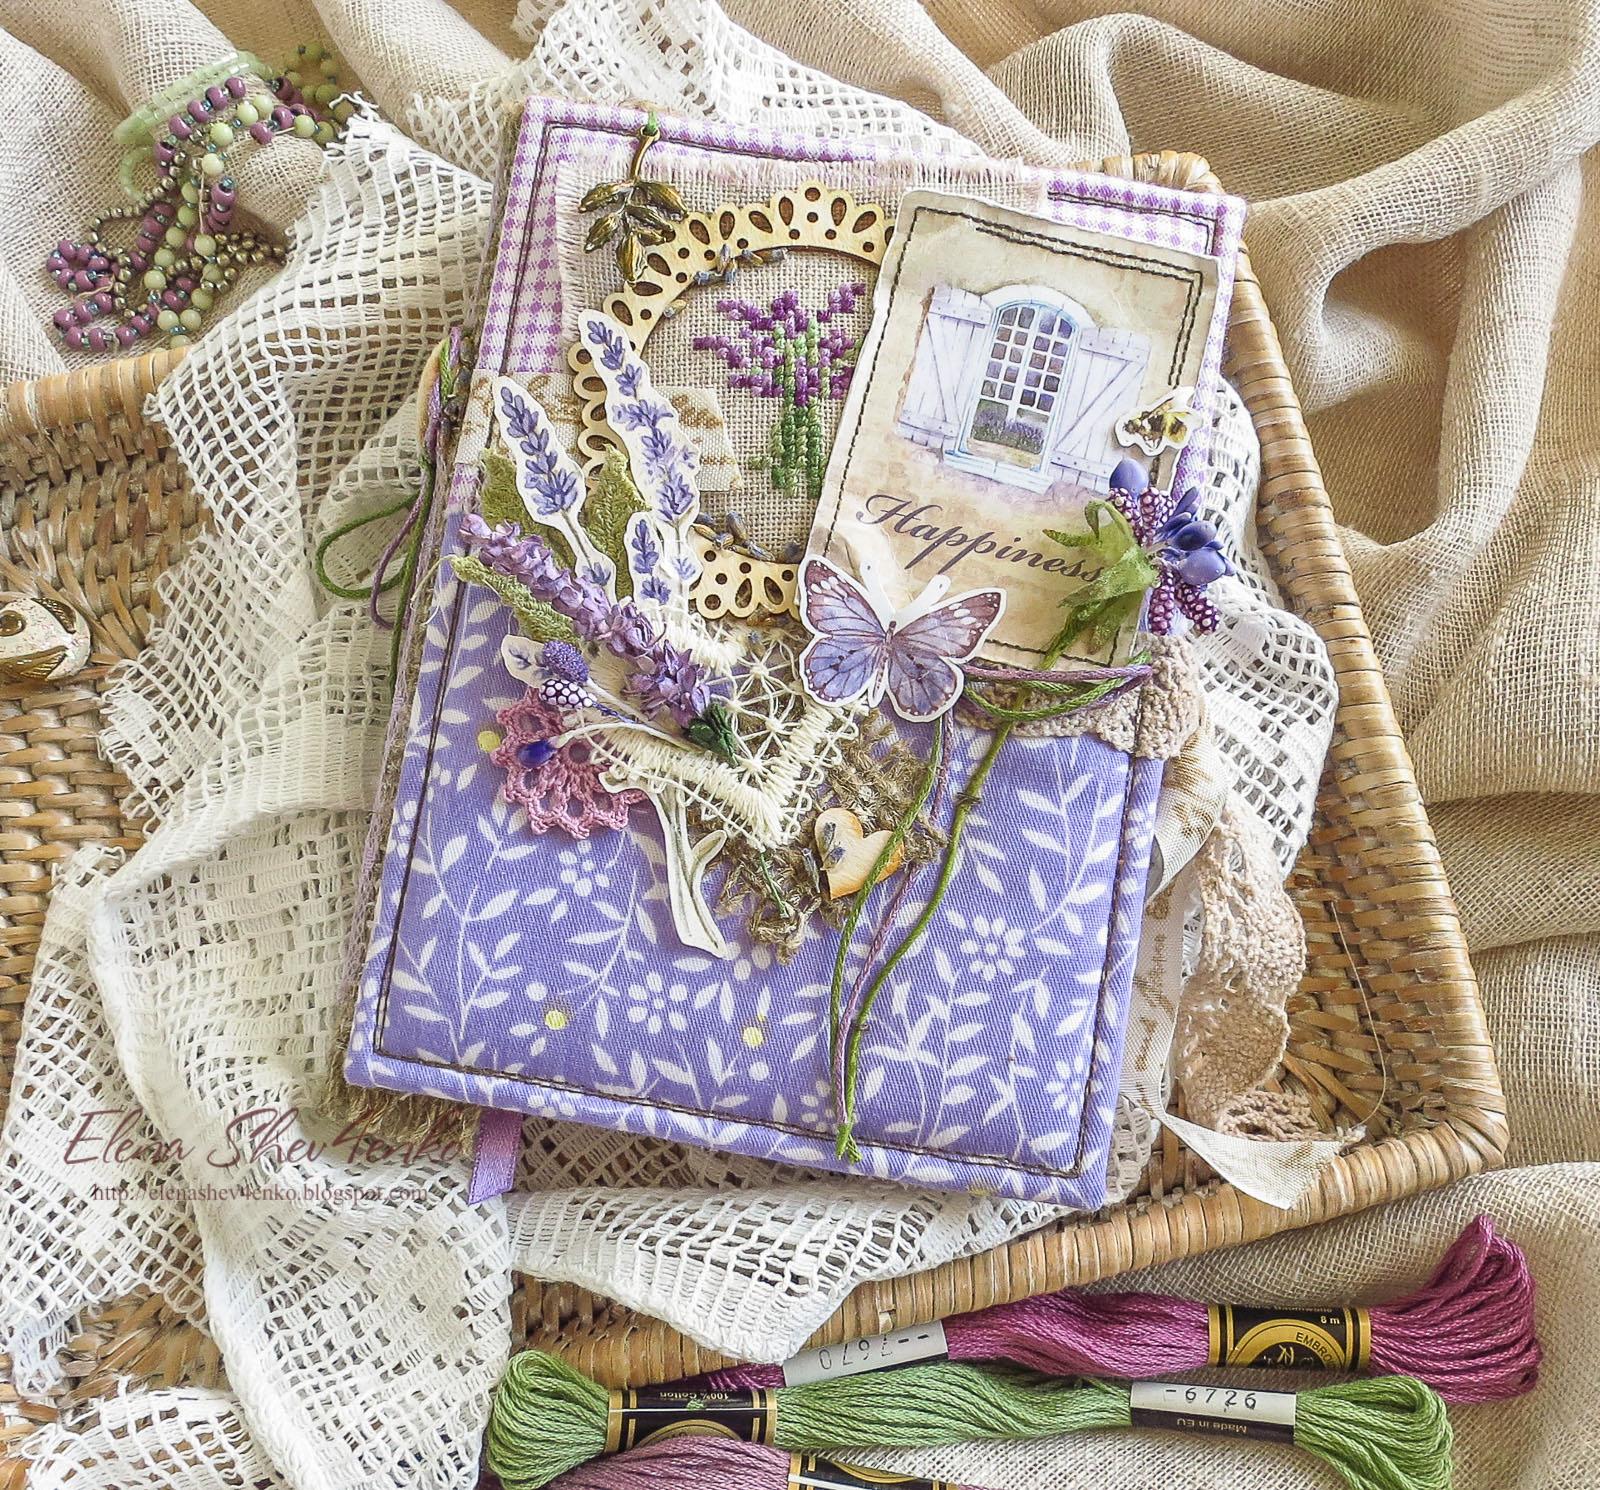 lavender, notebook, лаванда, вышивка в скрапе, прикладная вышивка, блокнот с вышивкой, блокнот ручной работы, лавандовое саше, embroidered lavender